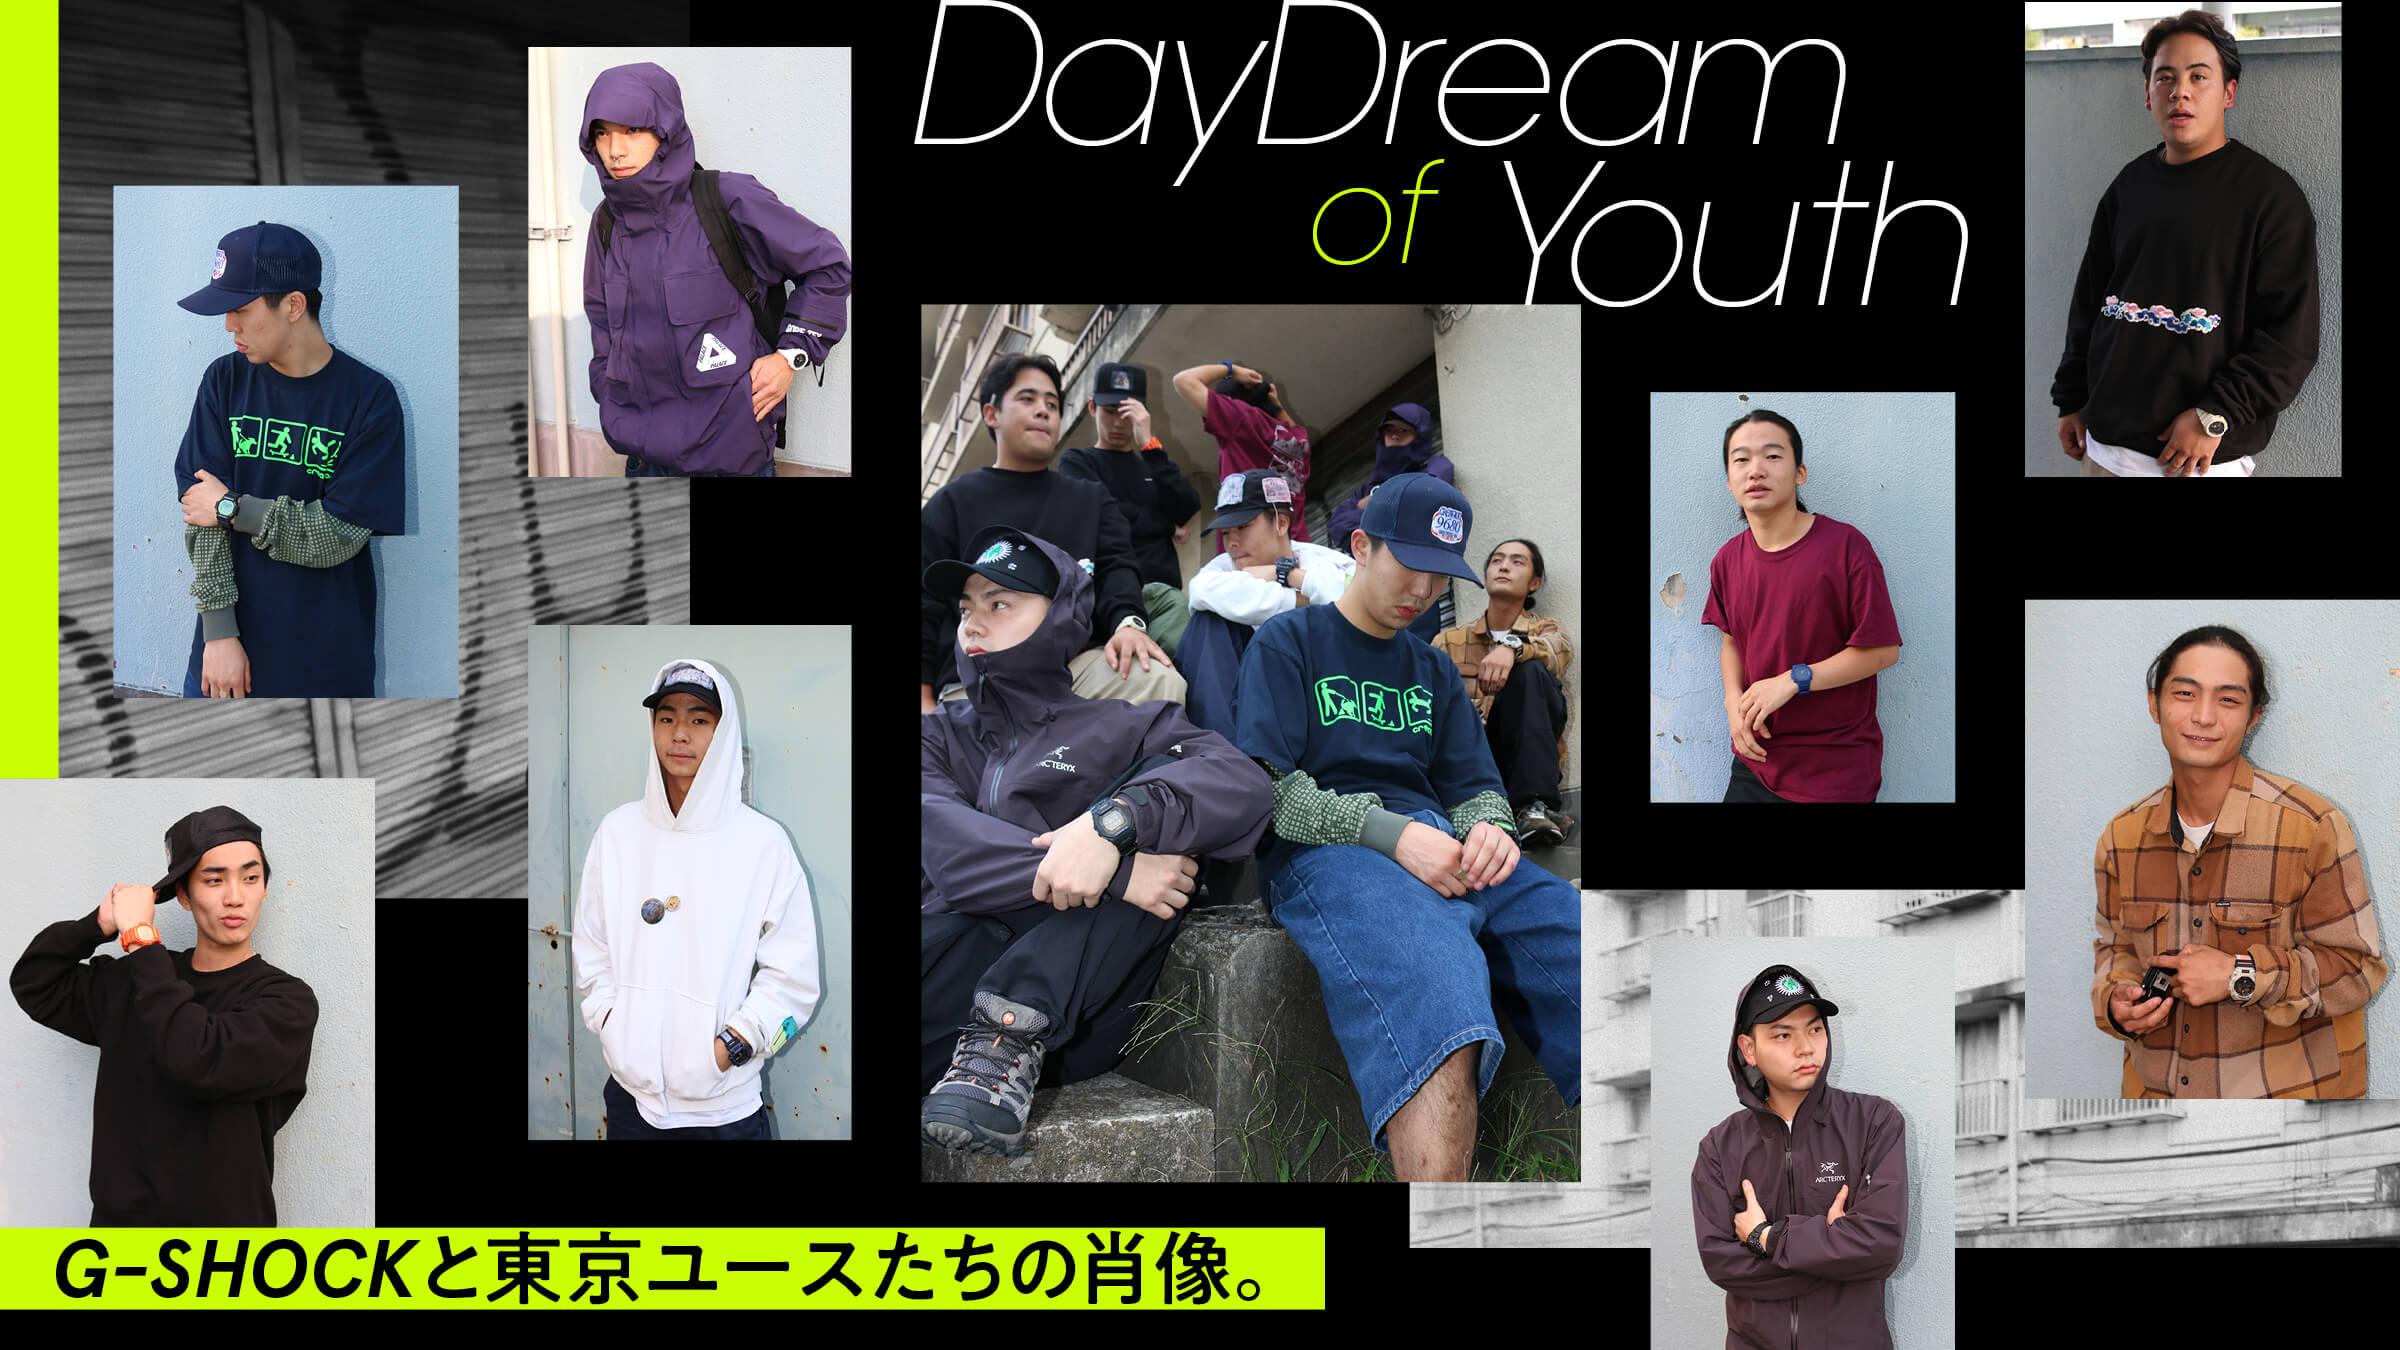 G-SHOCKと東京ユースたちの肖像。